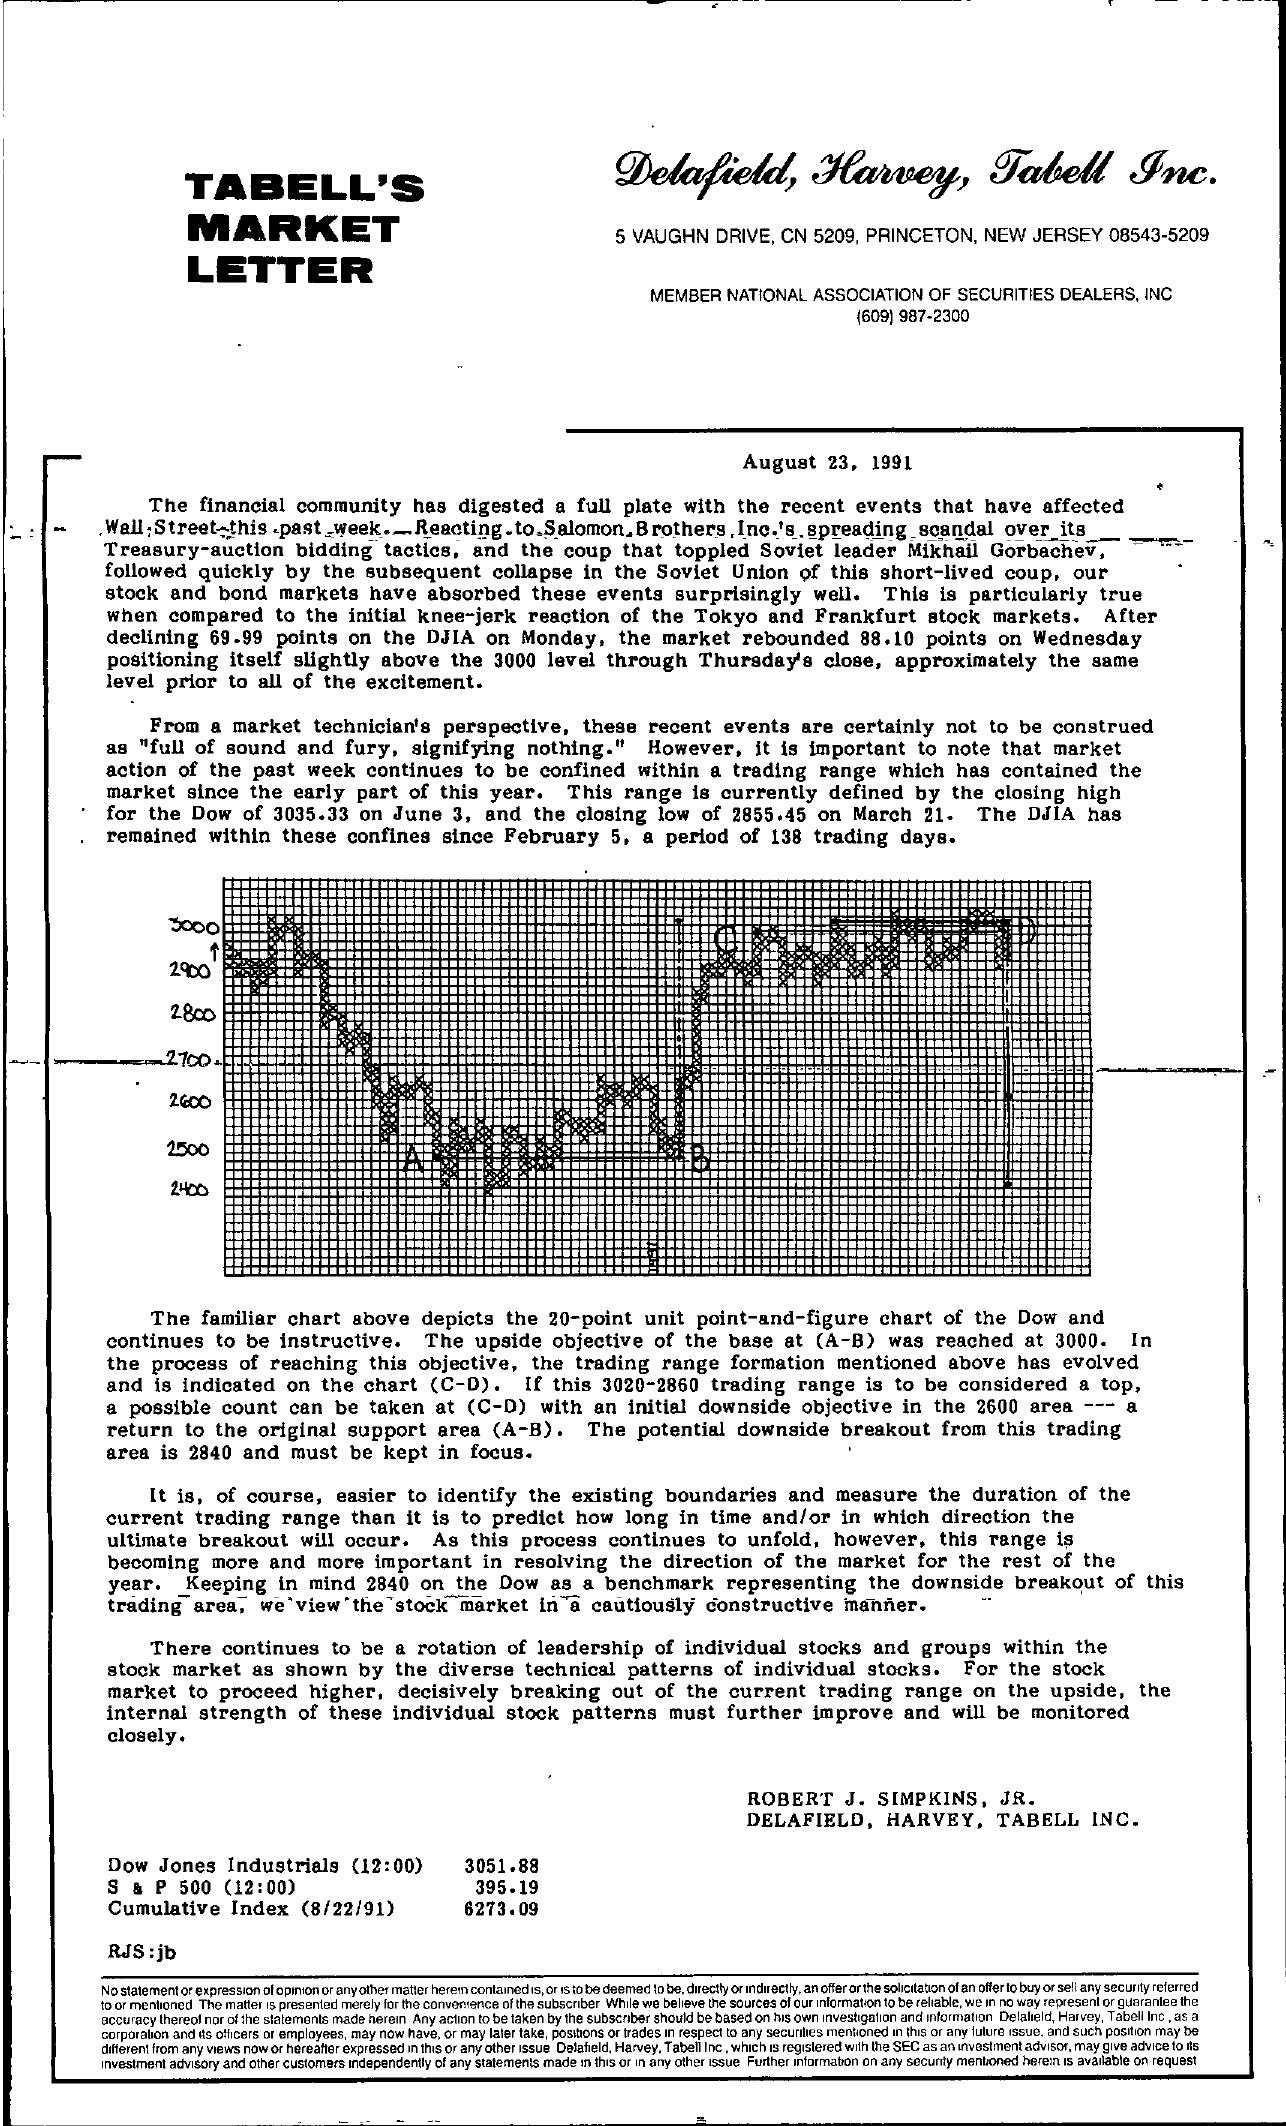 Tabell's Market Letter - August 23, 1991